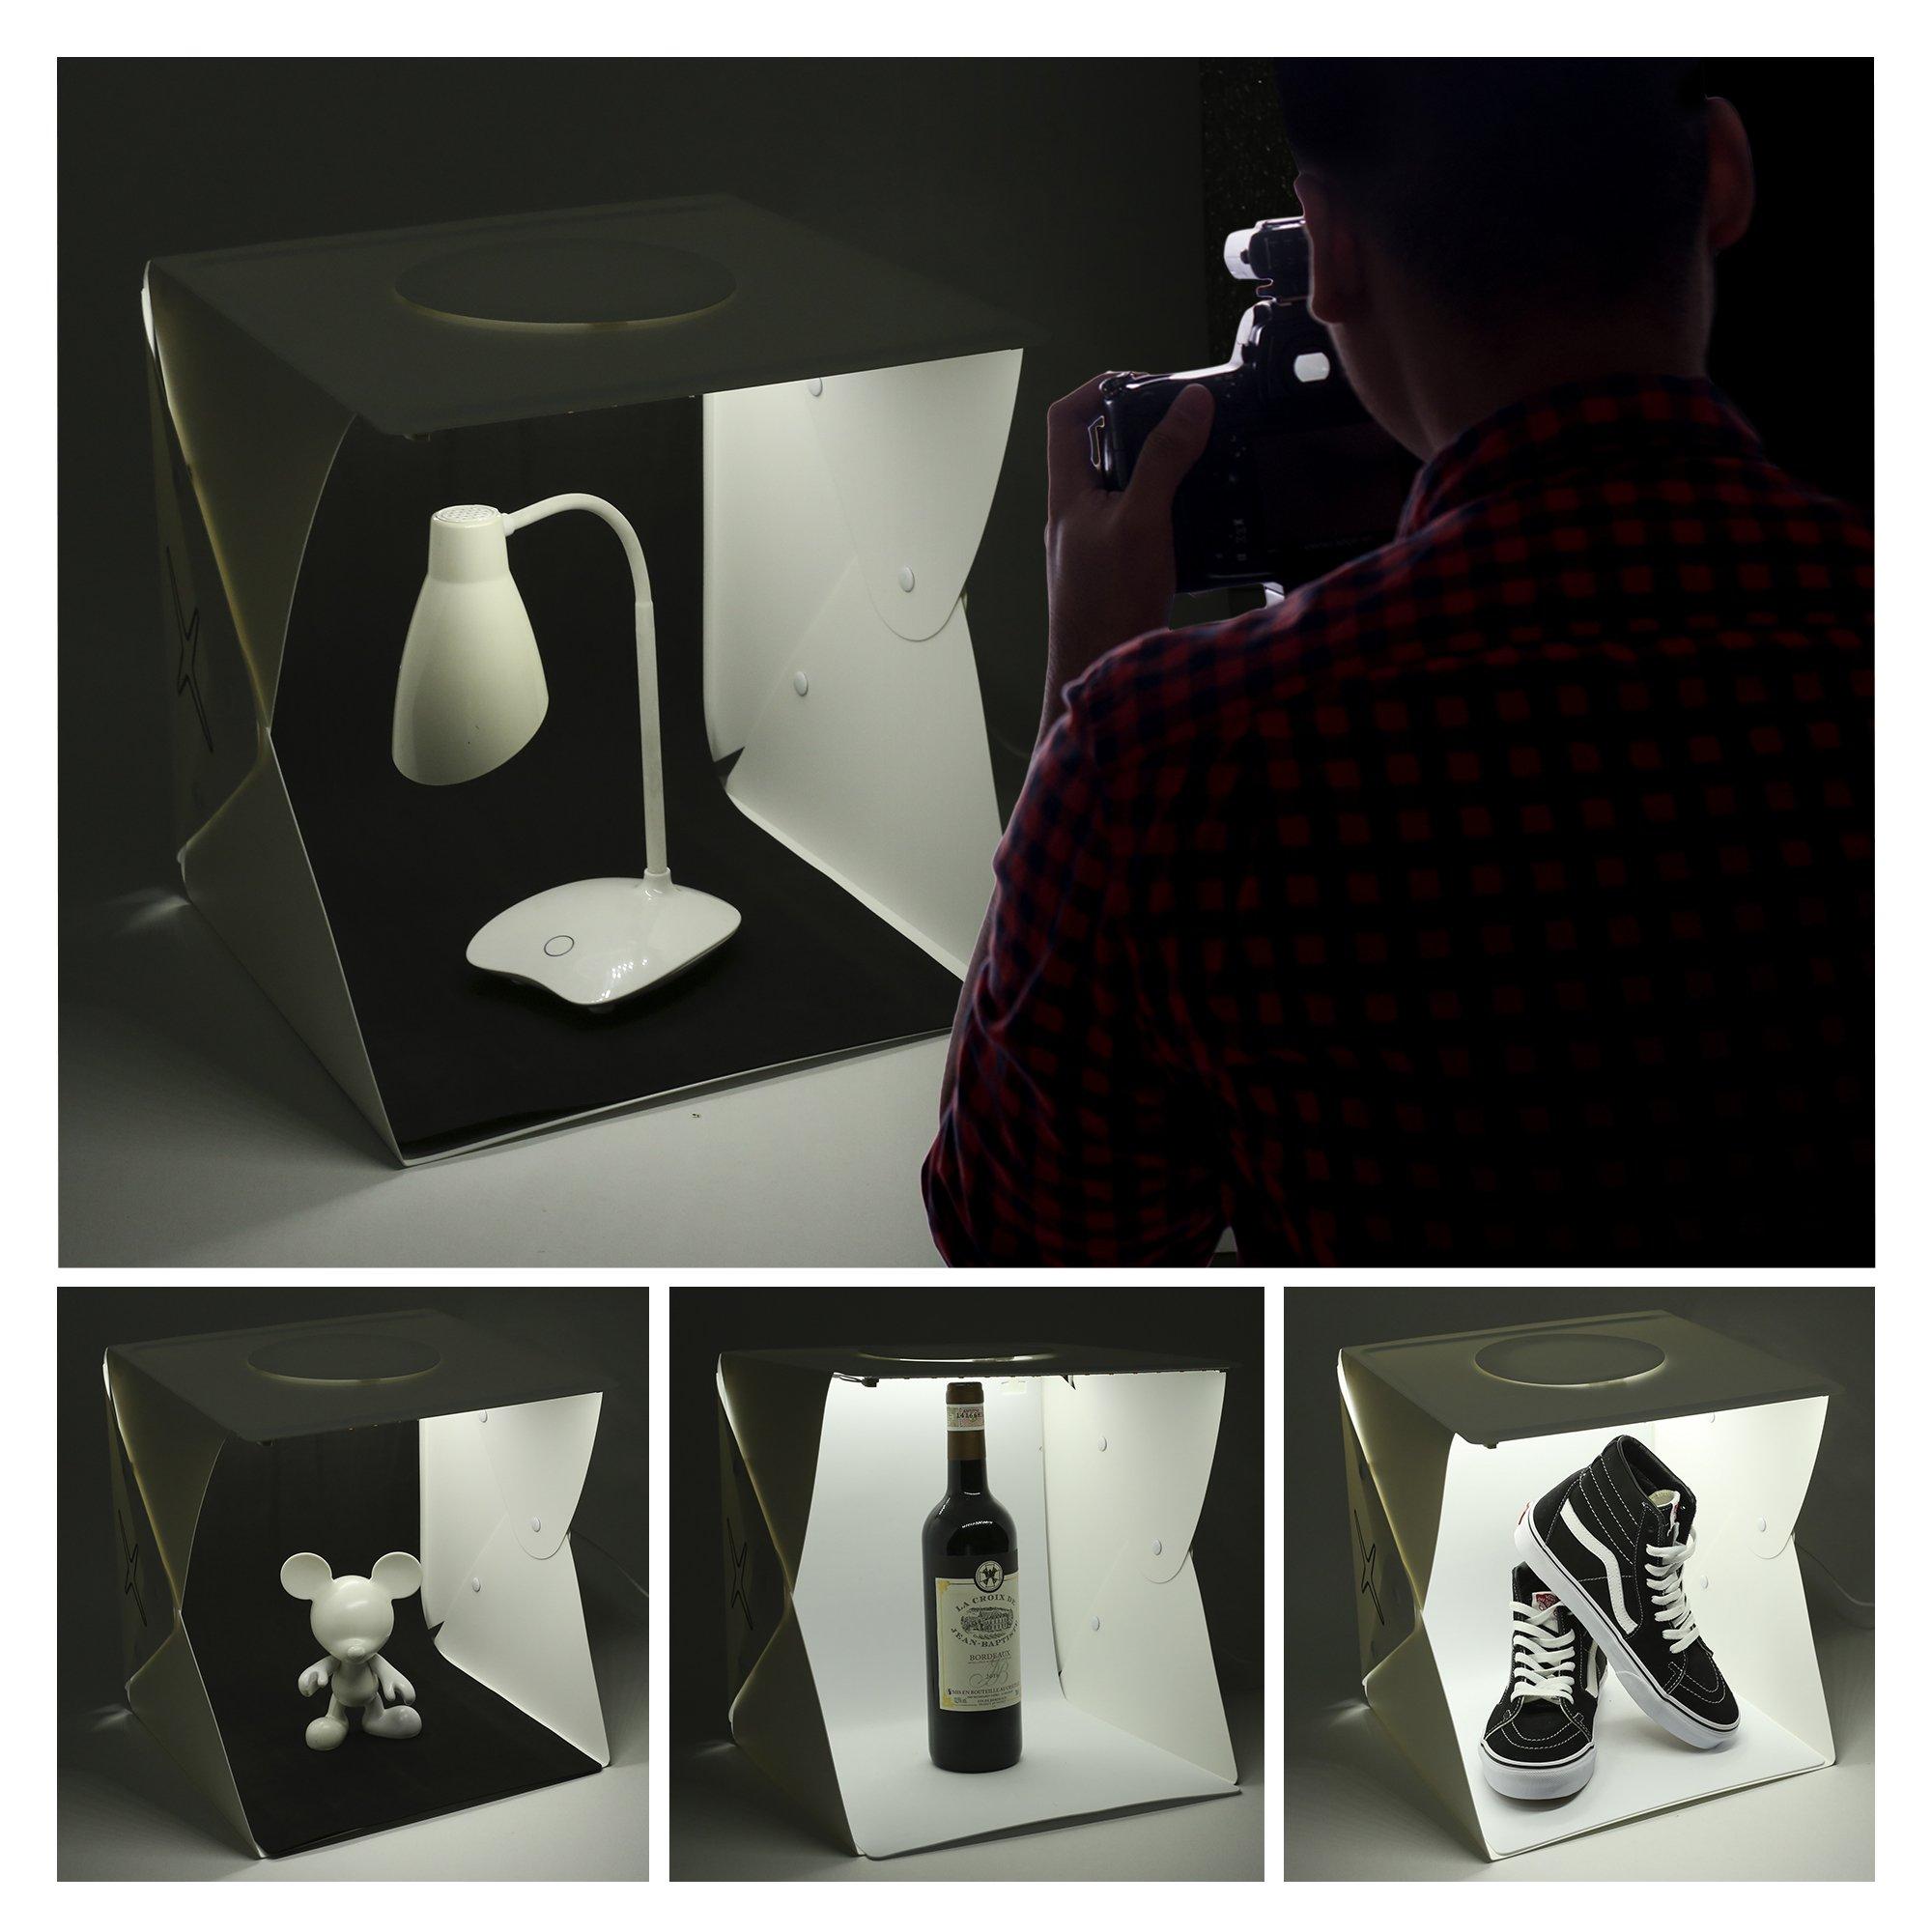 Capture Portable Photo Studio Box: LED Light Box Photo Tent- Large by Capture (Image #6)